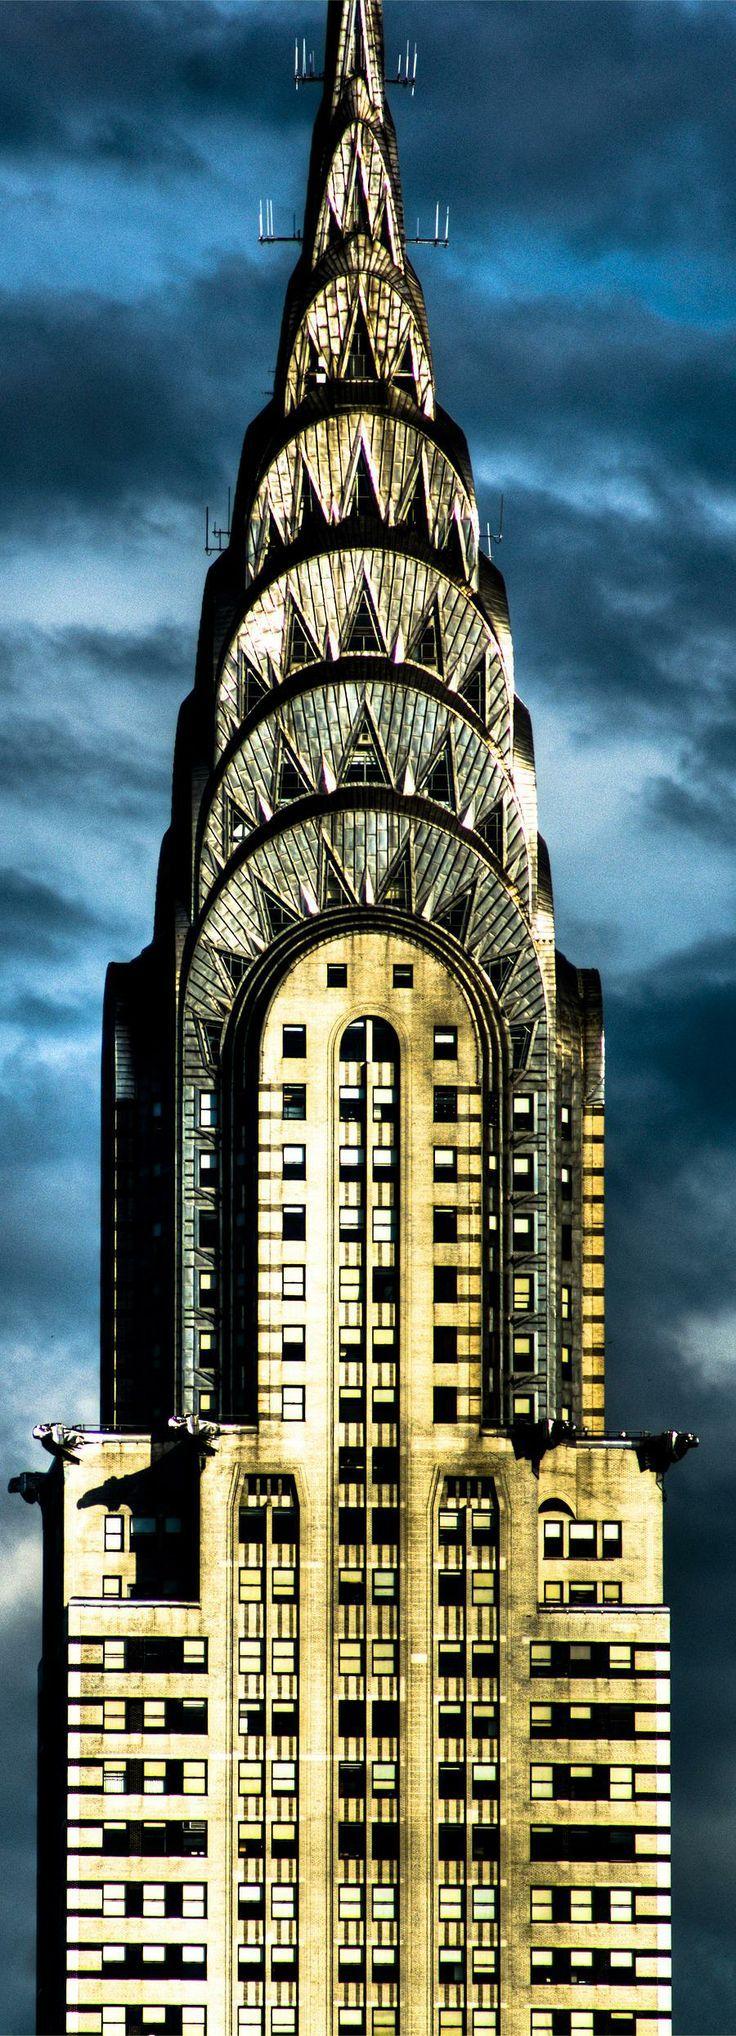 The Queen of Art Deco(1930), Crysler Building Manhattan NYC